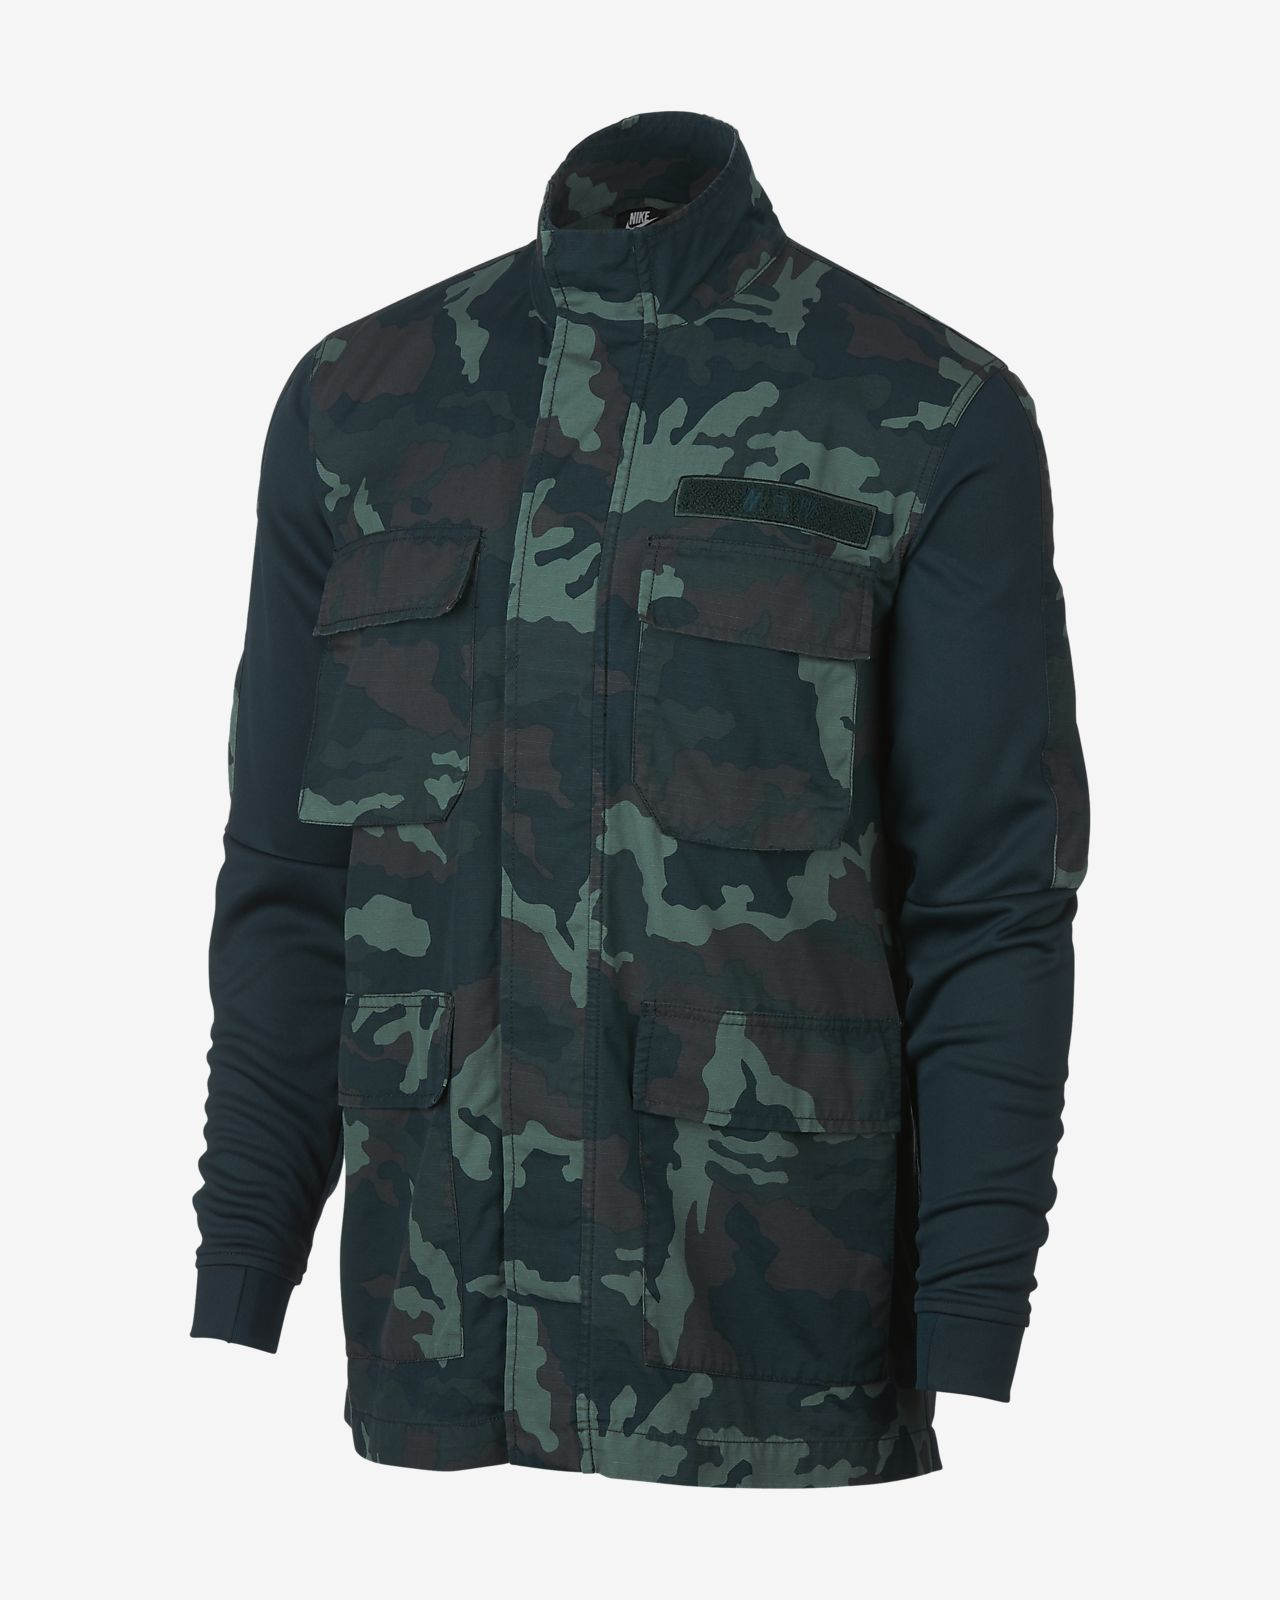 prix compétitif be8cf b239c Veste camouflage Nike Sportswear NSW pour Homme